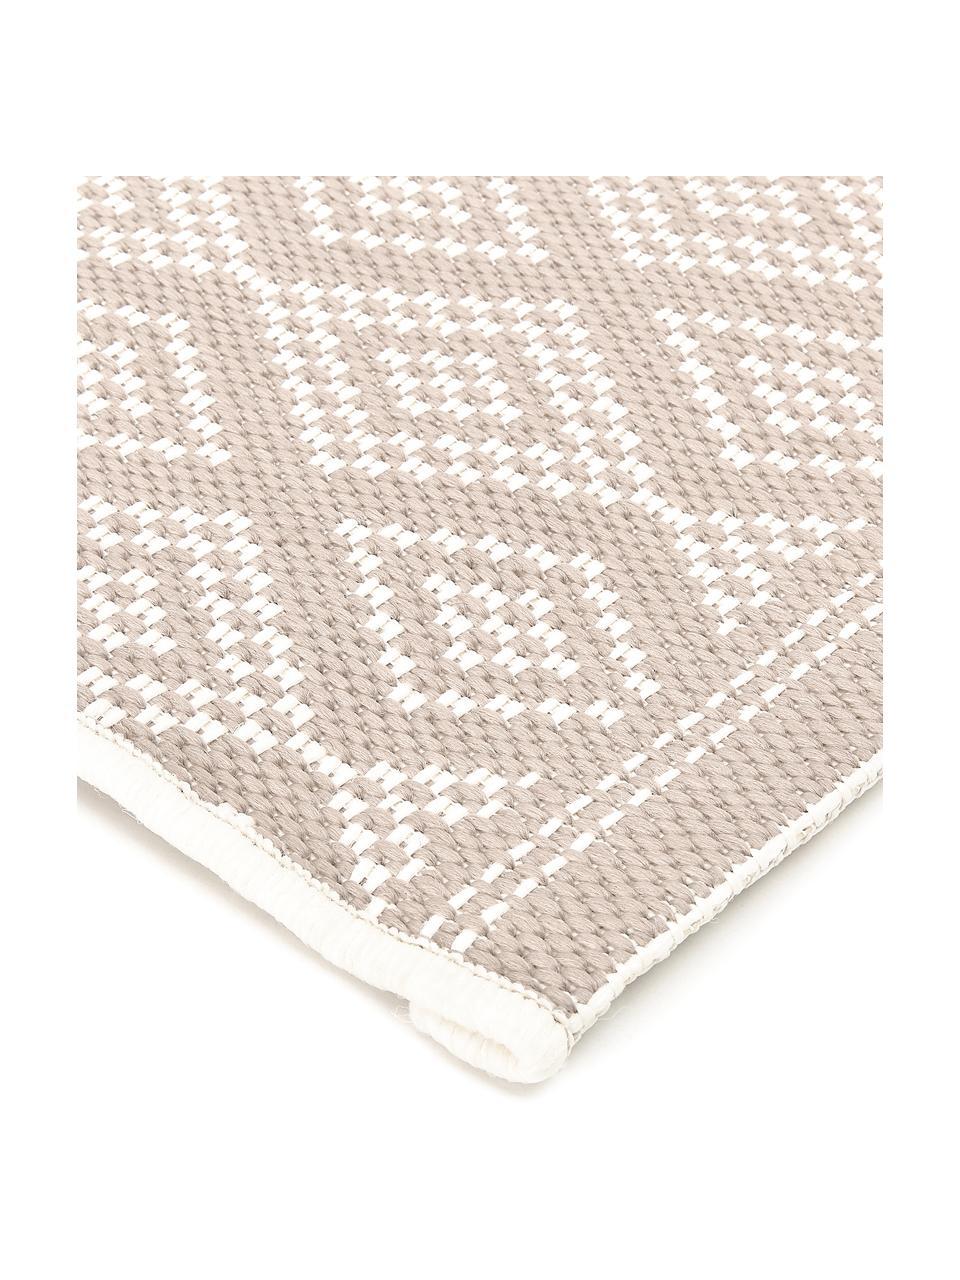 Passatoia beige/crema da interno-esterno Capri, 86% polipropilene, 14% poliestere, Bianco crema, beige, Larg. 80 x Lung. 250 cm